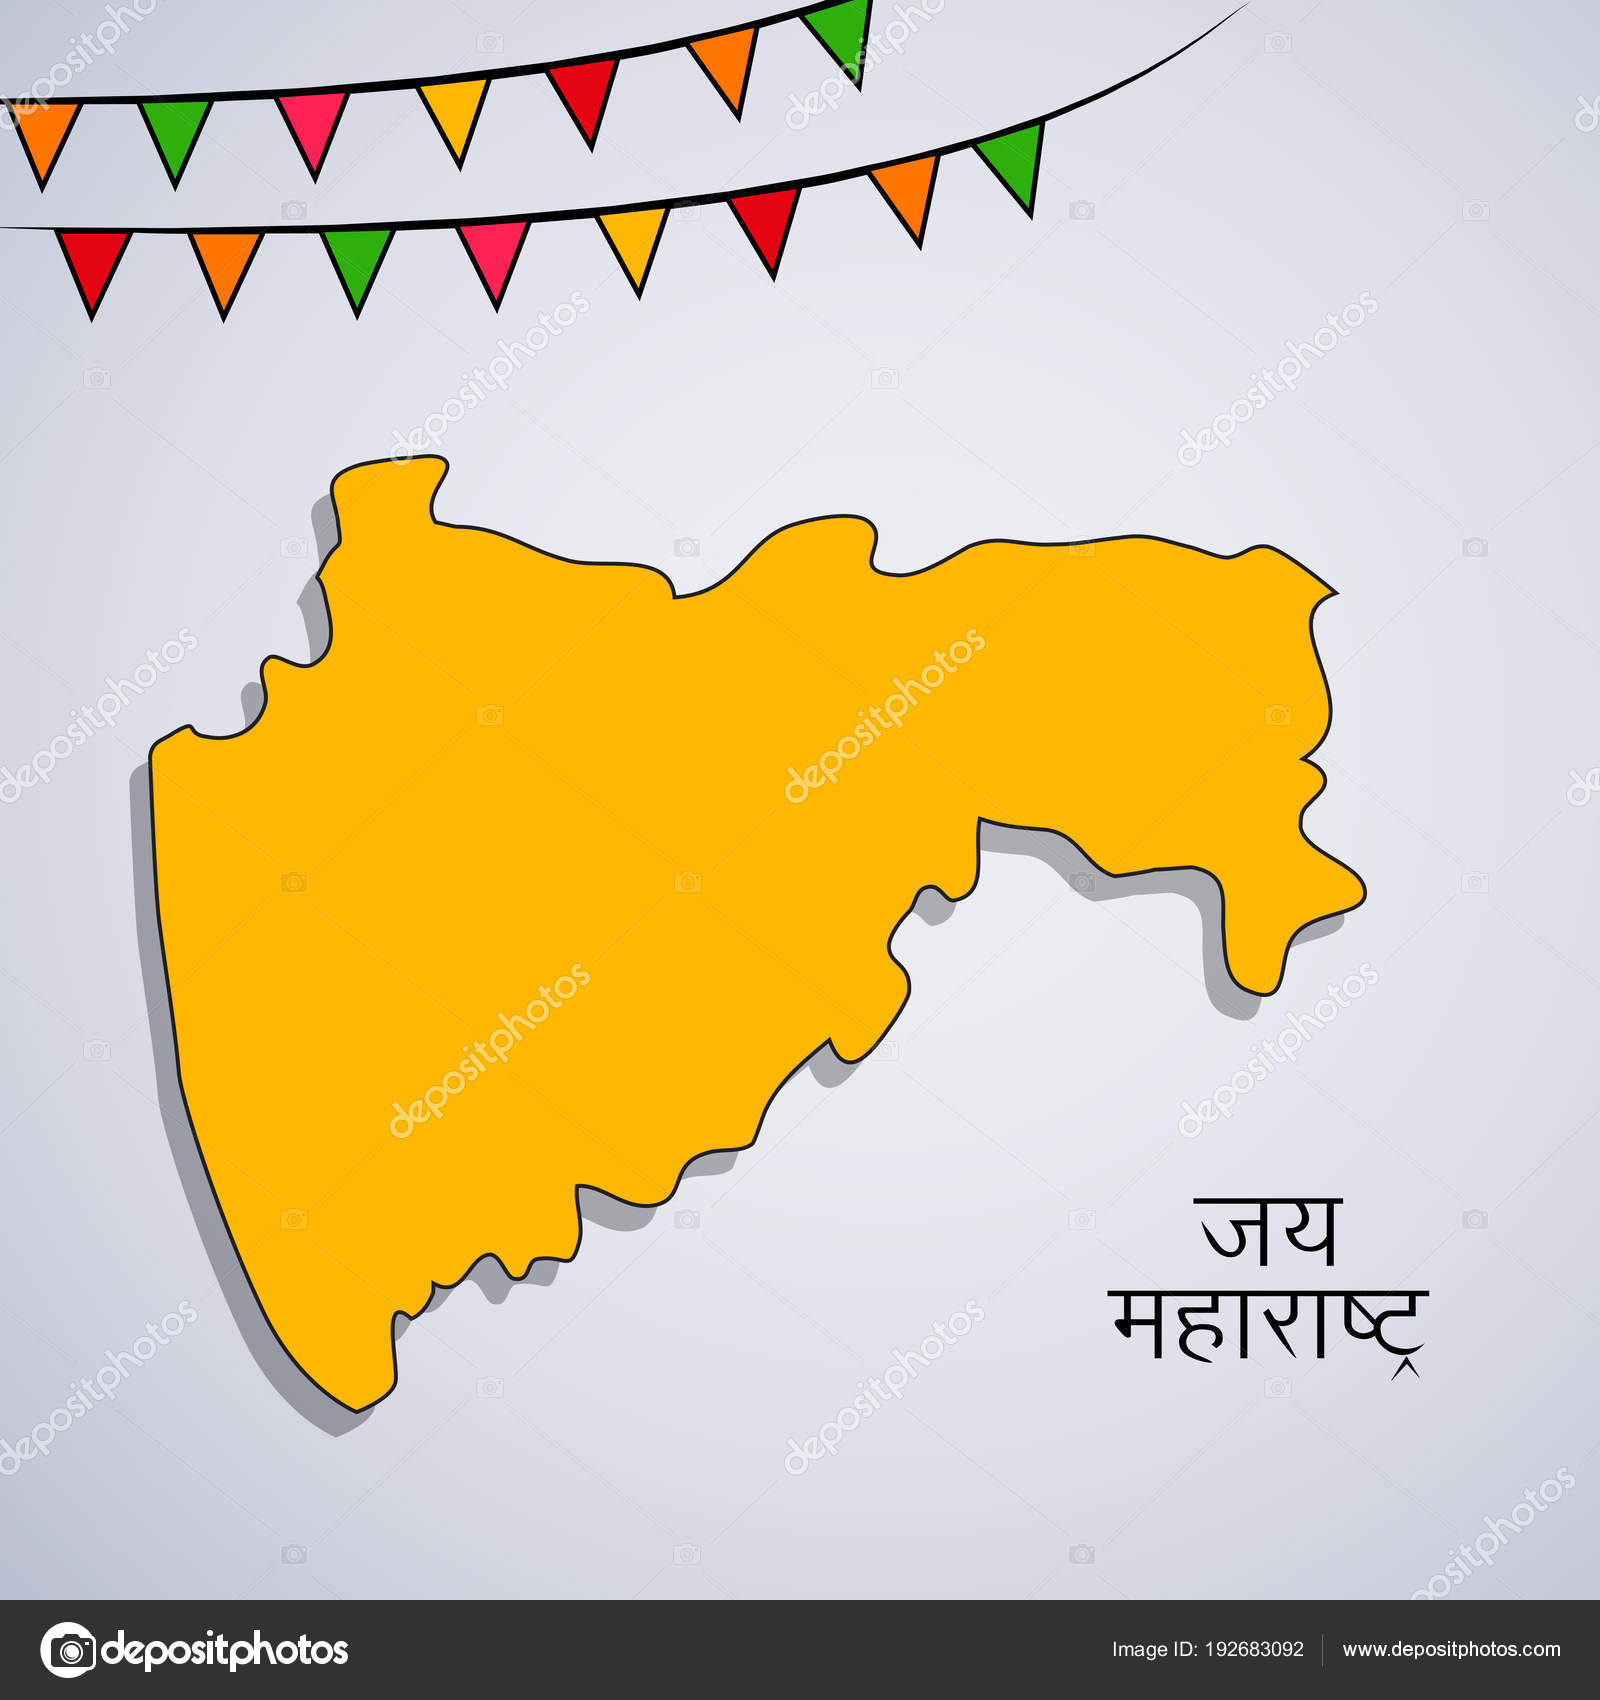 Illustration Indian State Maharashtra Map Hindi Text Jai ... on